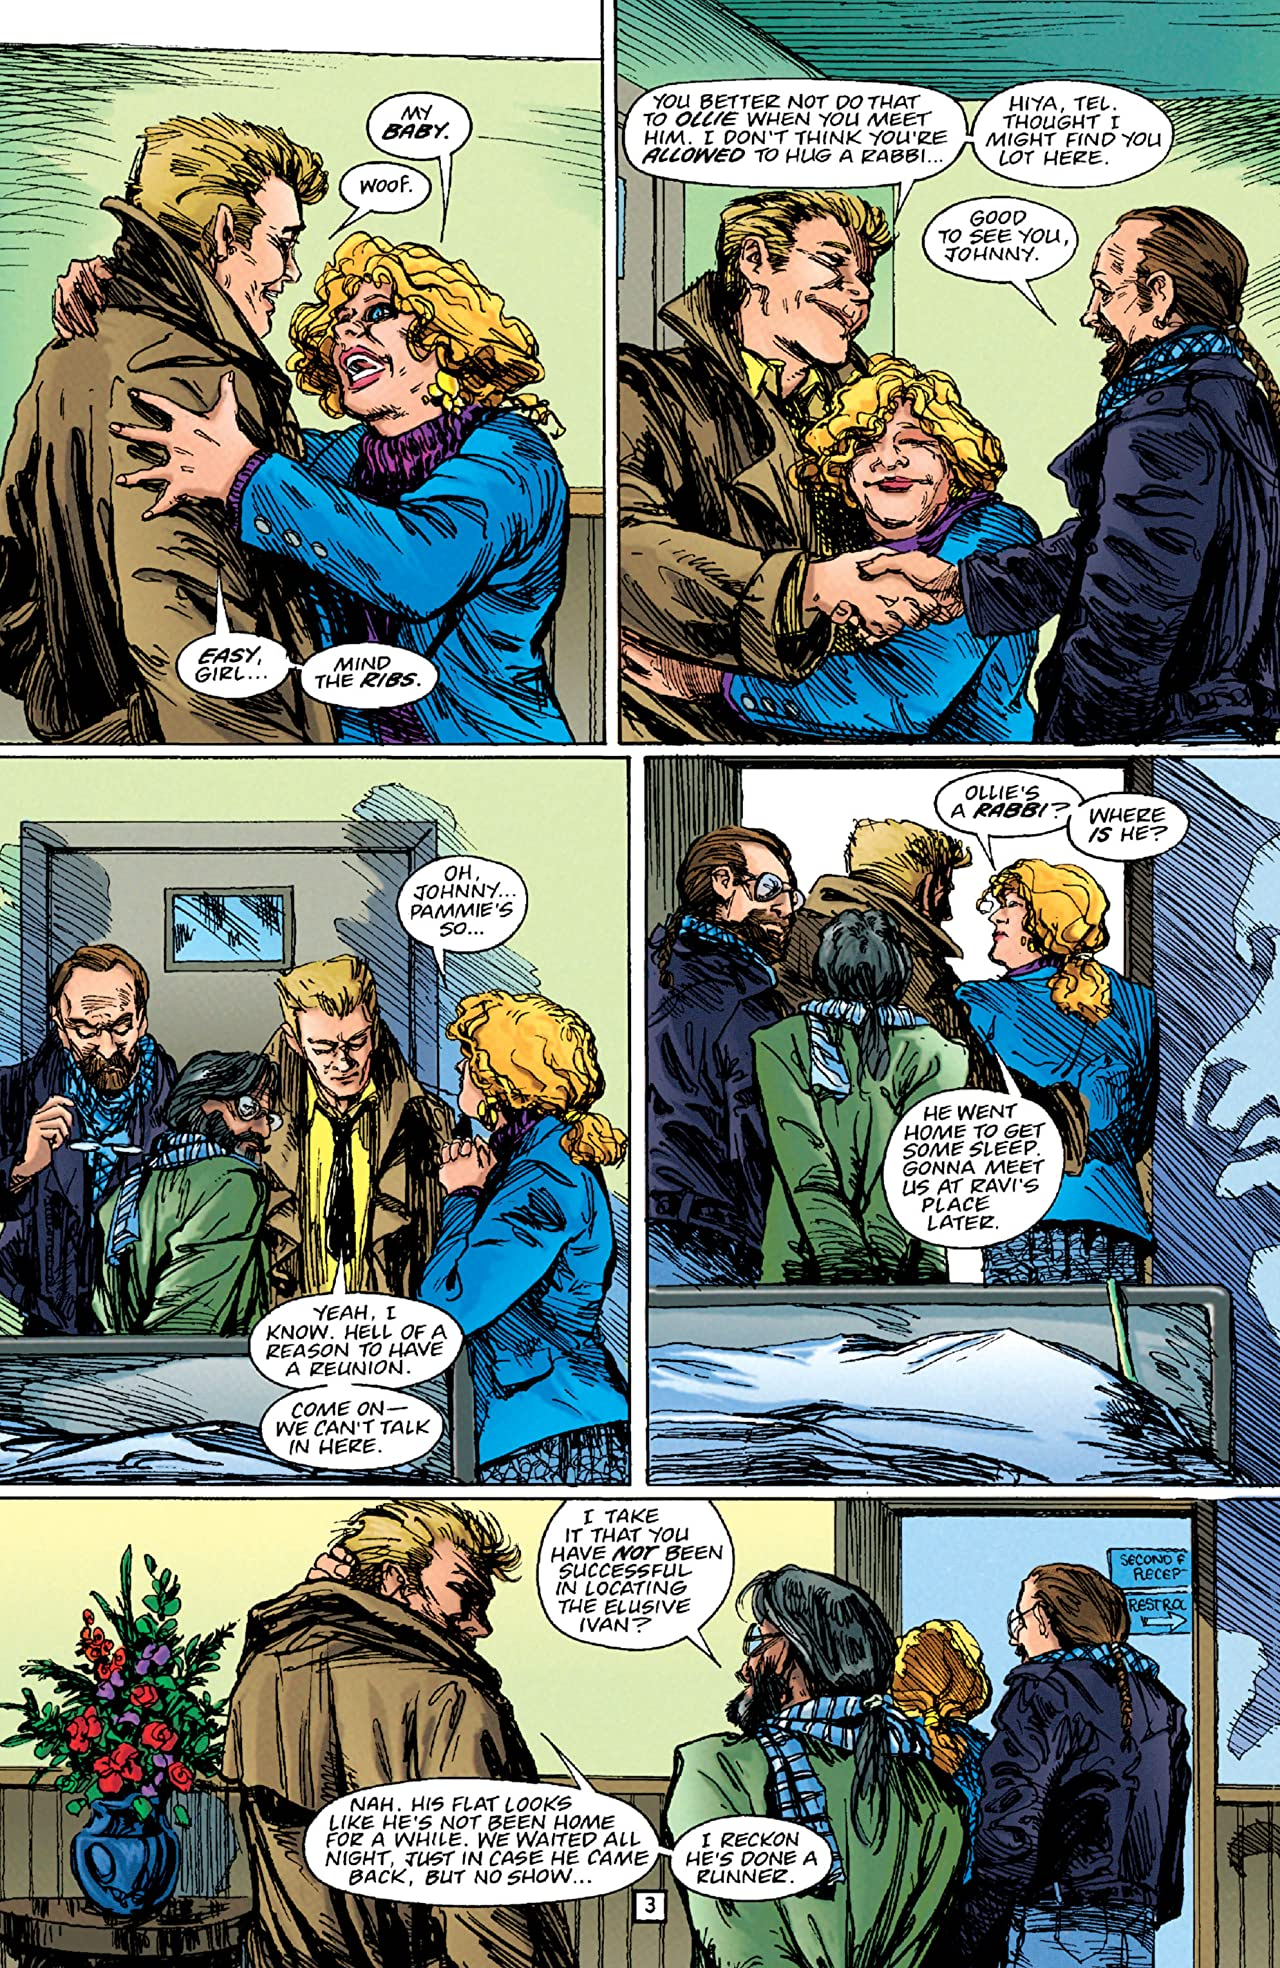 The Sandman Presents: Love Street #3 (of 3)